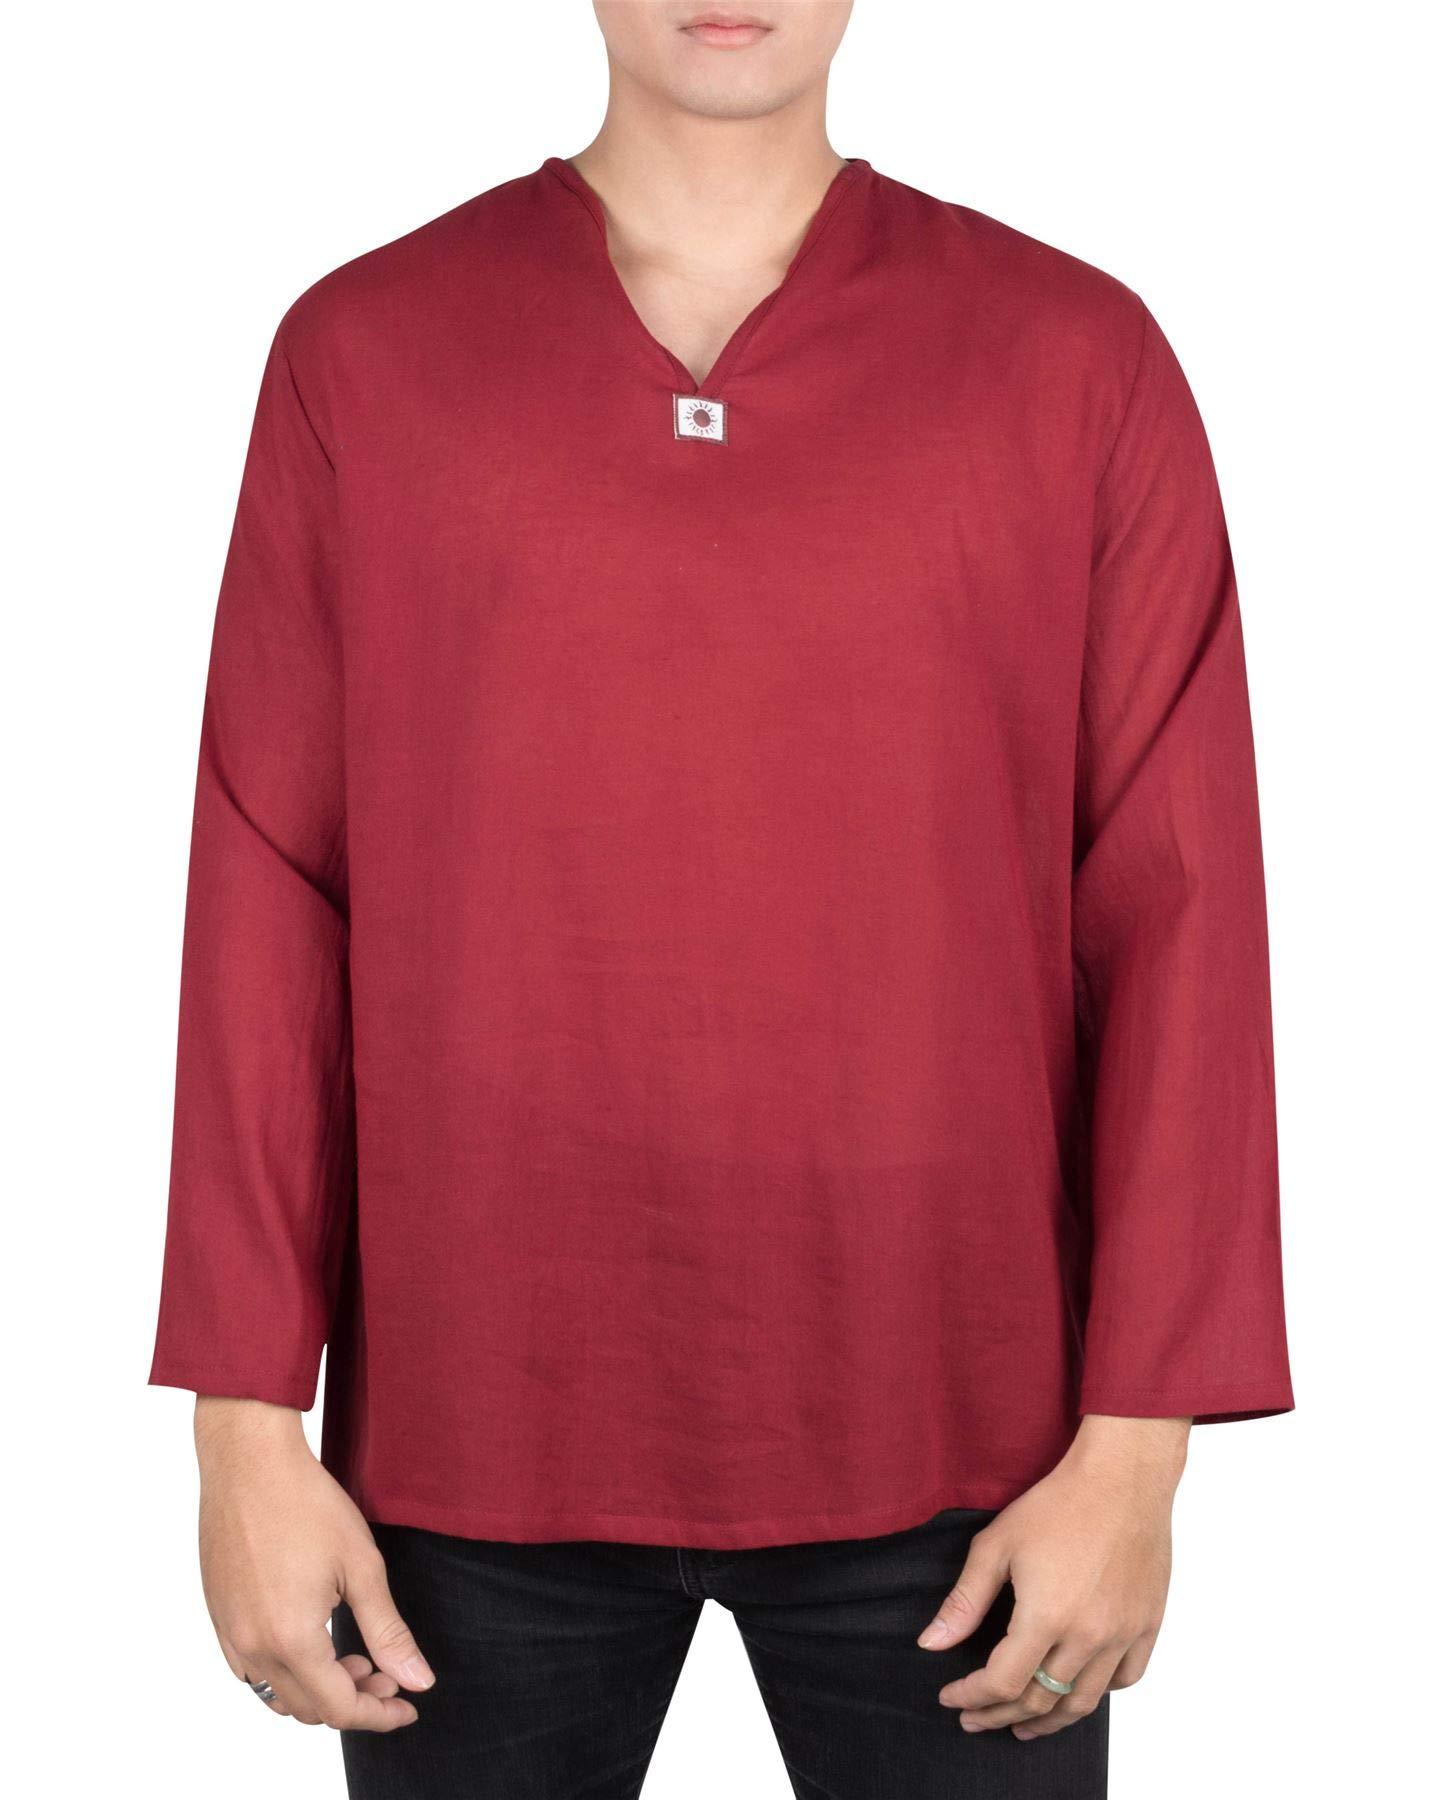 Lofbaz Men's V-Neck T-Shirt 100% Cotton Thai Hippie Shirt Yoga Top Burgundy 2XL